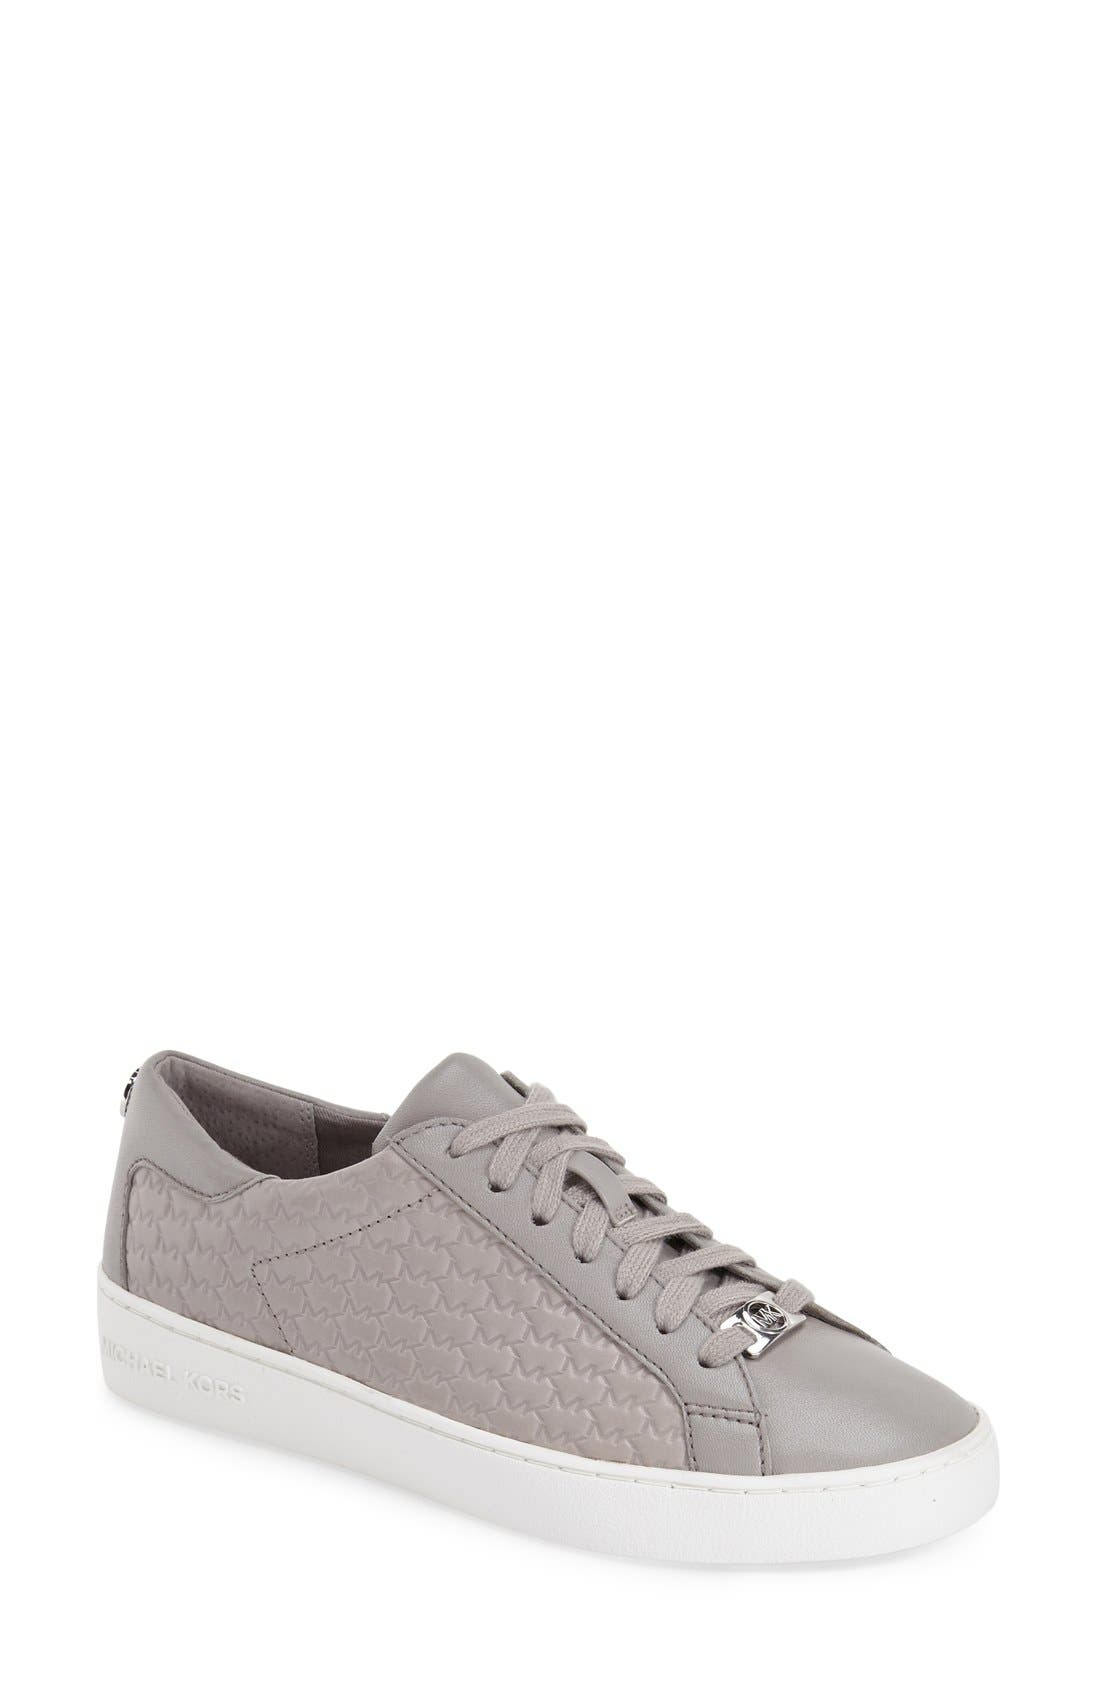 Alternate Image 1 Selected - MICHAEL Michael Kors 'Colby' Textured Sneaker (Women)